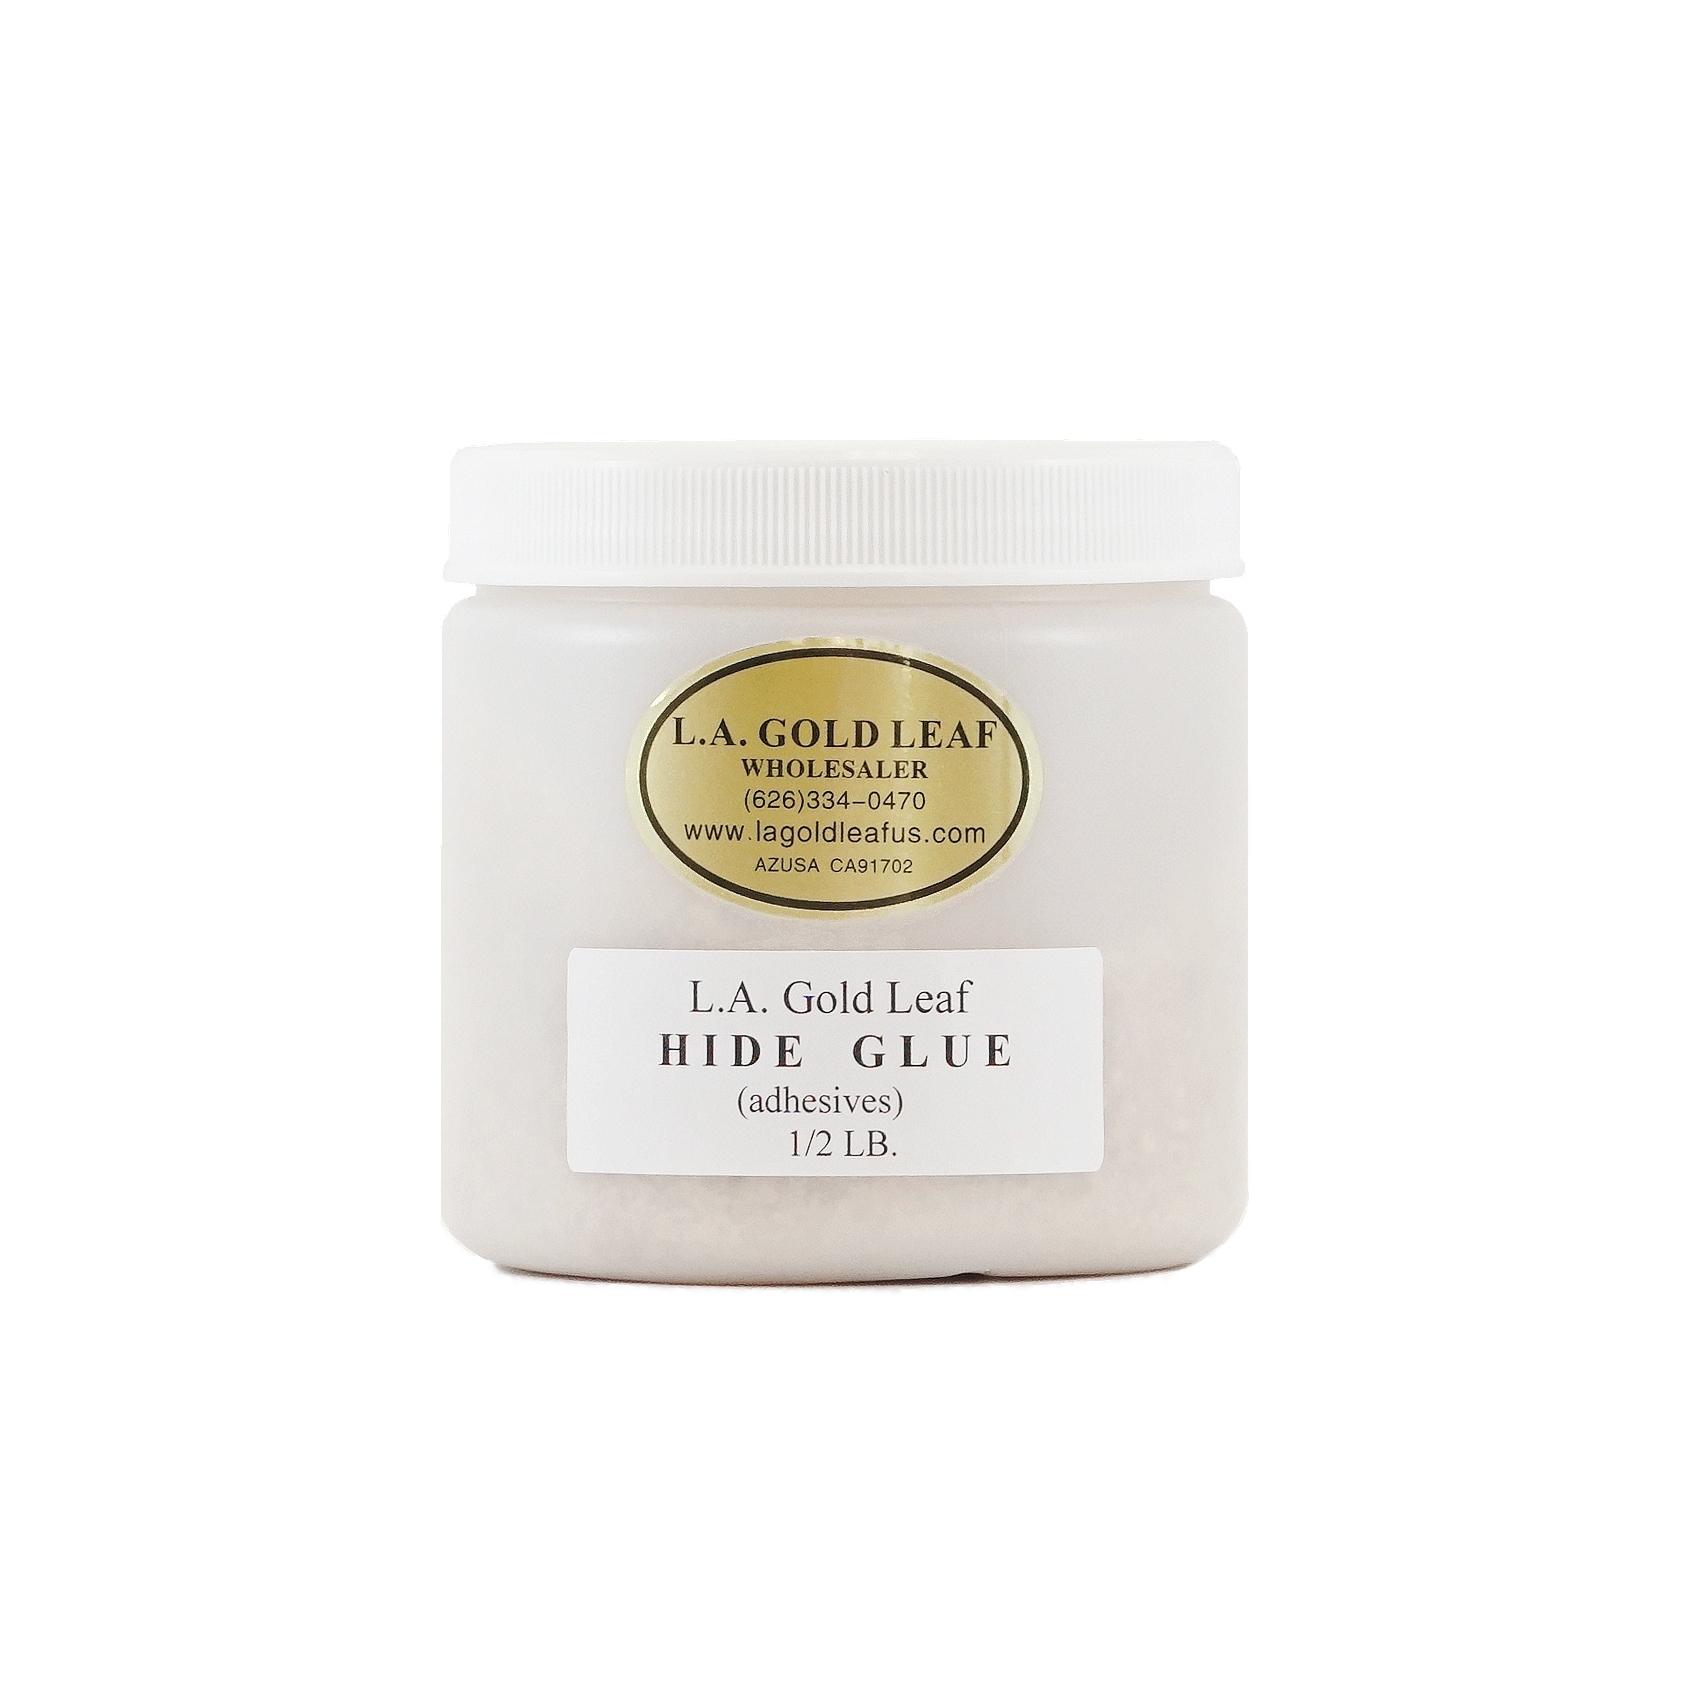 Hide Glue 1/2 LB